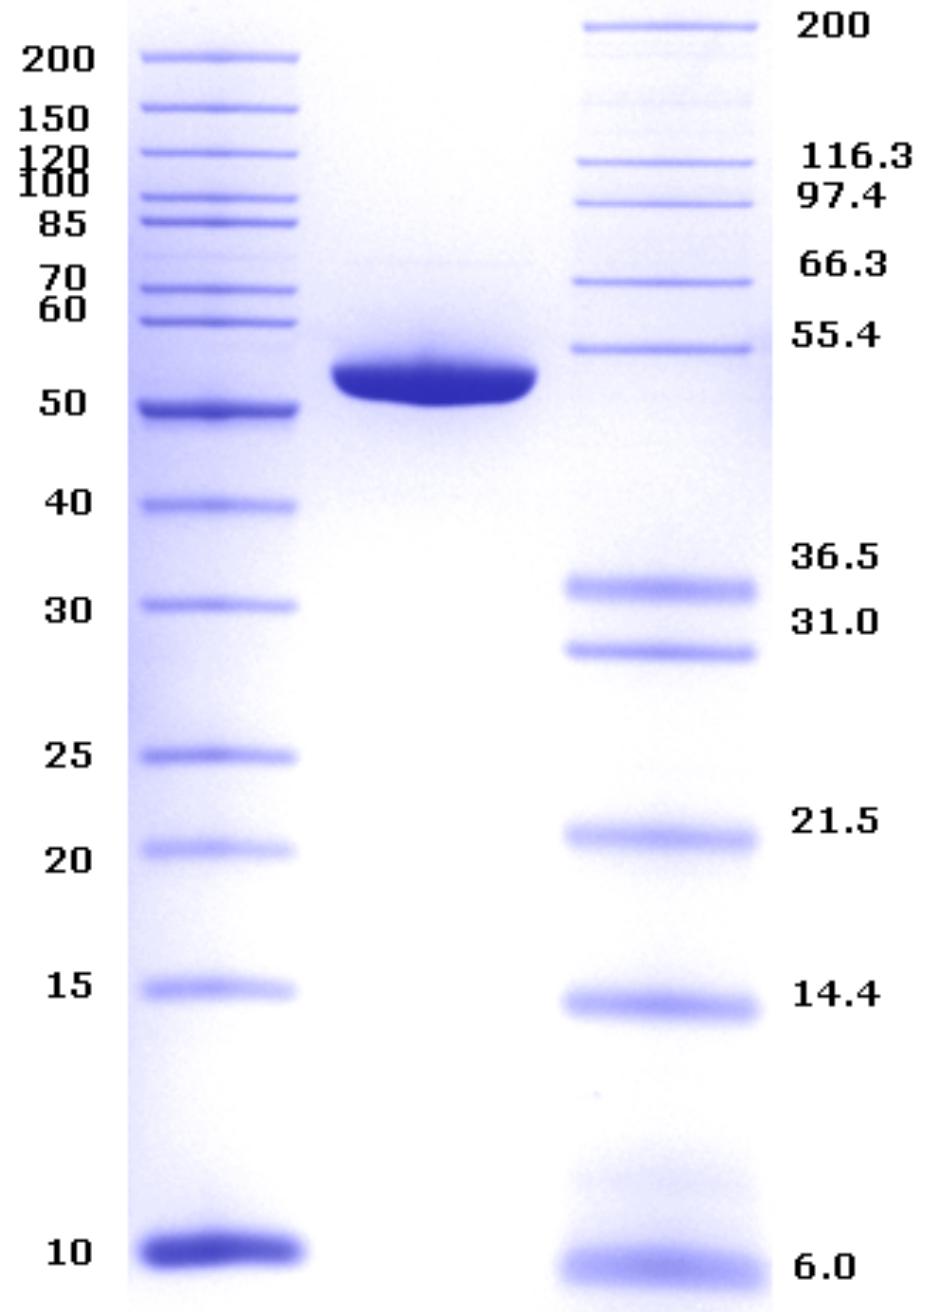 Proteros Product Image - beta-catenin (human) (Hs134-670)+TCF4(Hs1-53)